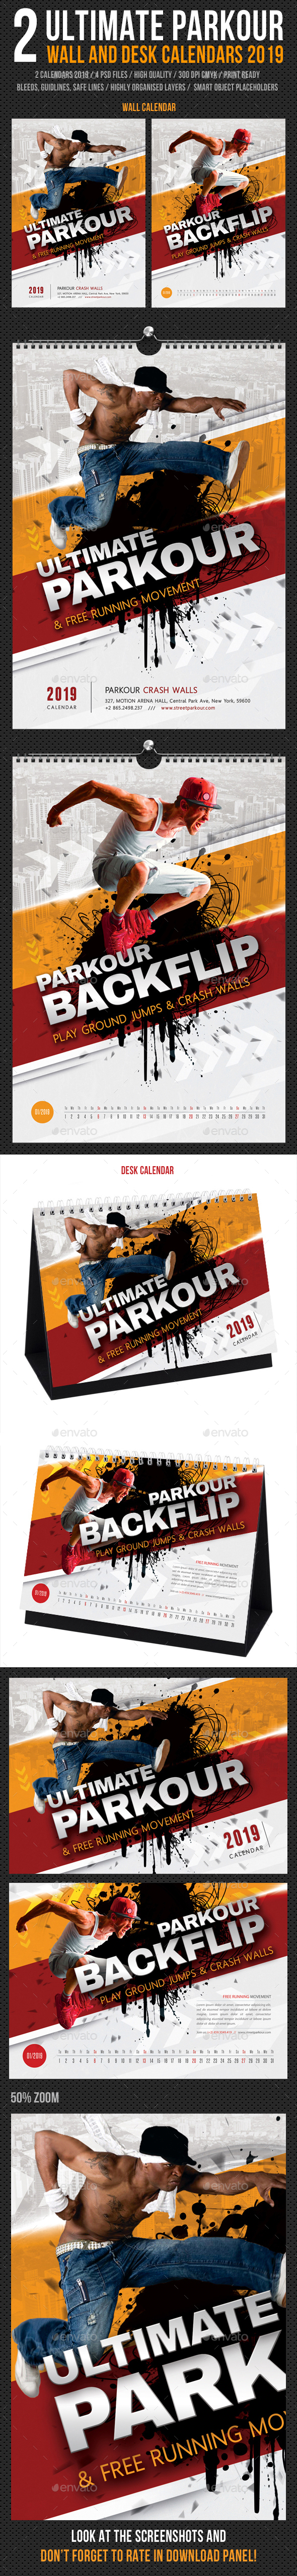 Ultimate Parkour Wall and Desk Calendars 2019 Bundle - Calendars Stationery